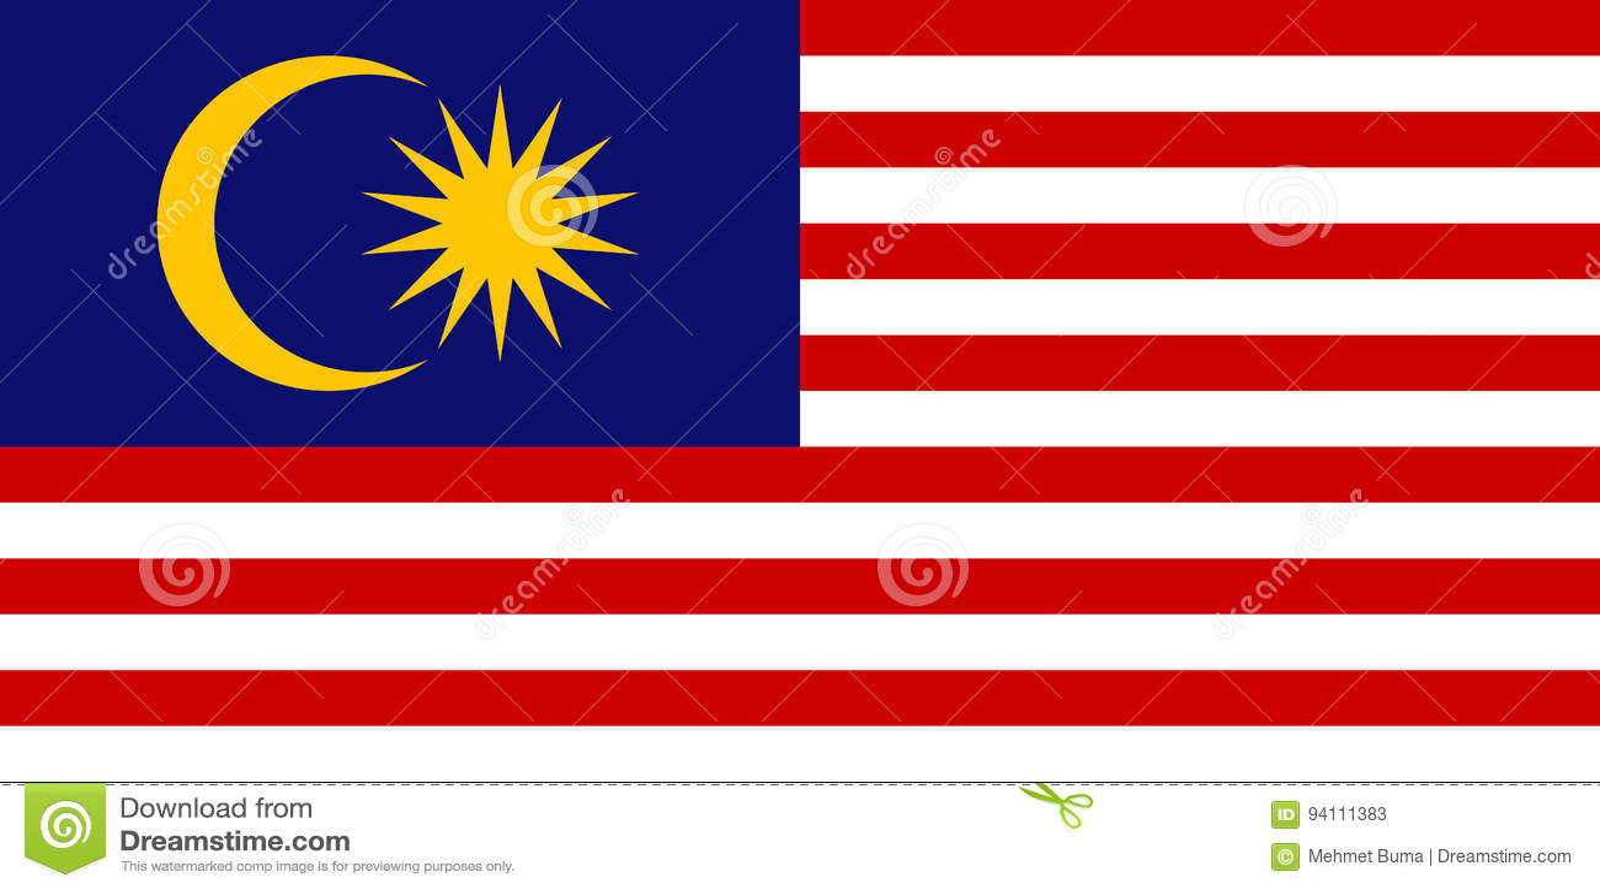 Maleise vlag, vlakke lay-out, vectorillustratie